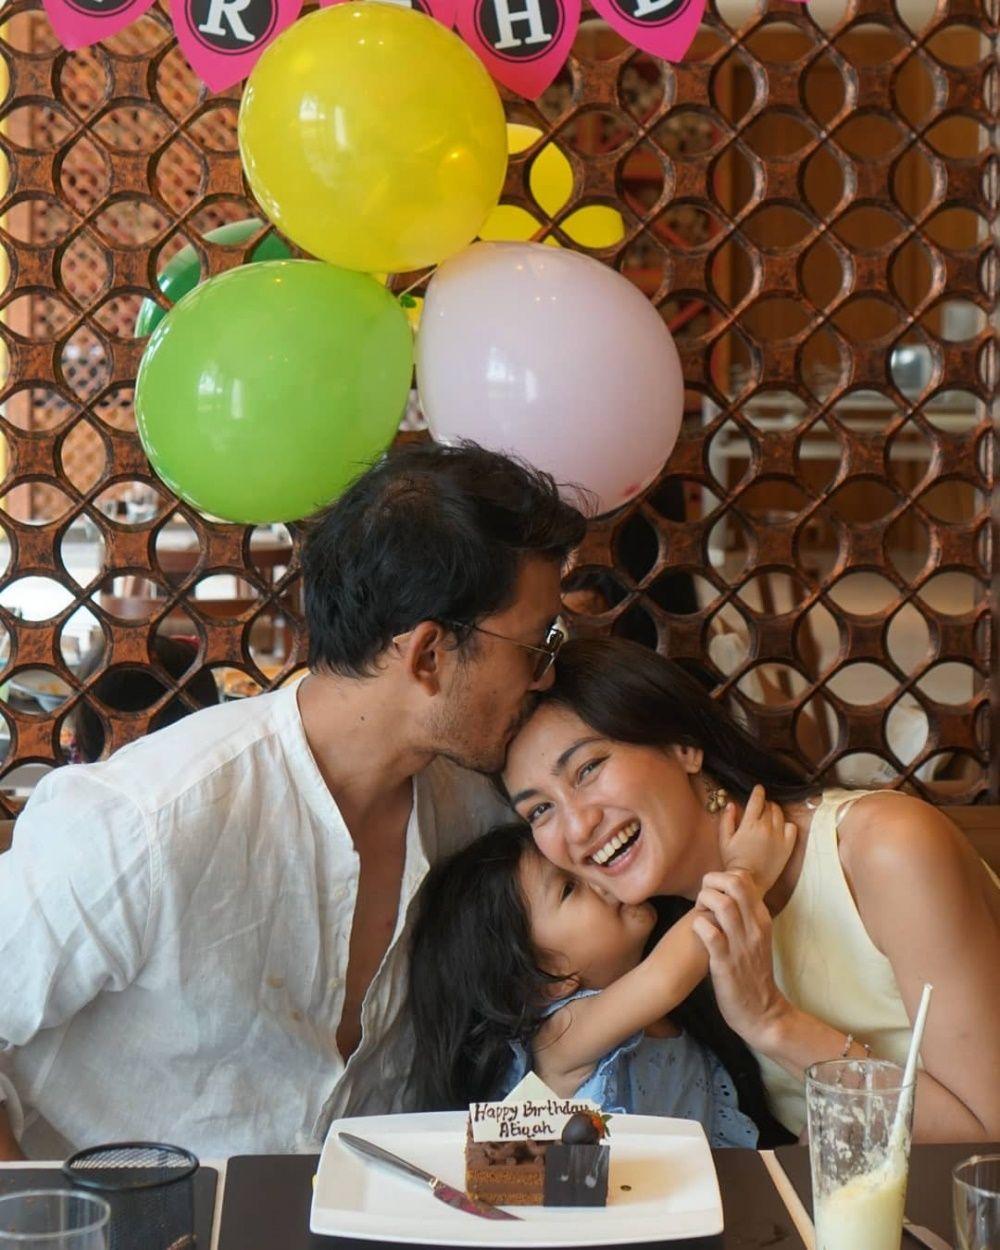 Family Goals! Intip 10 Potret Harmonis Rio Dewanto dan Keluarga